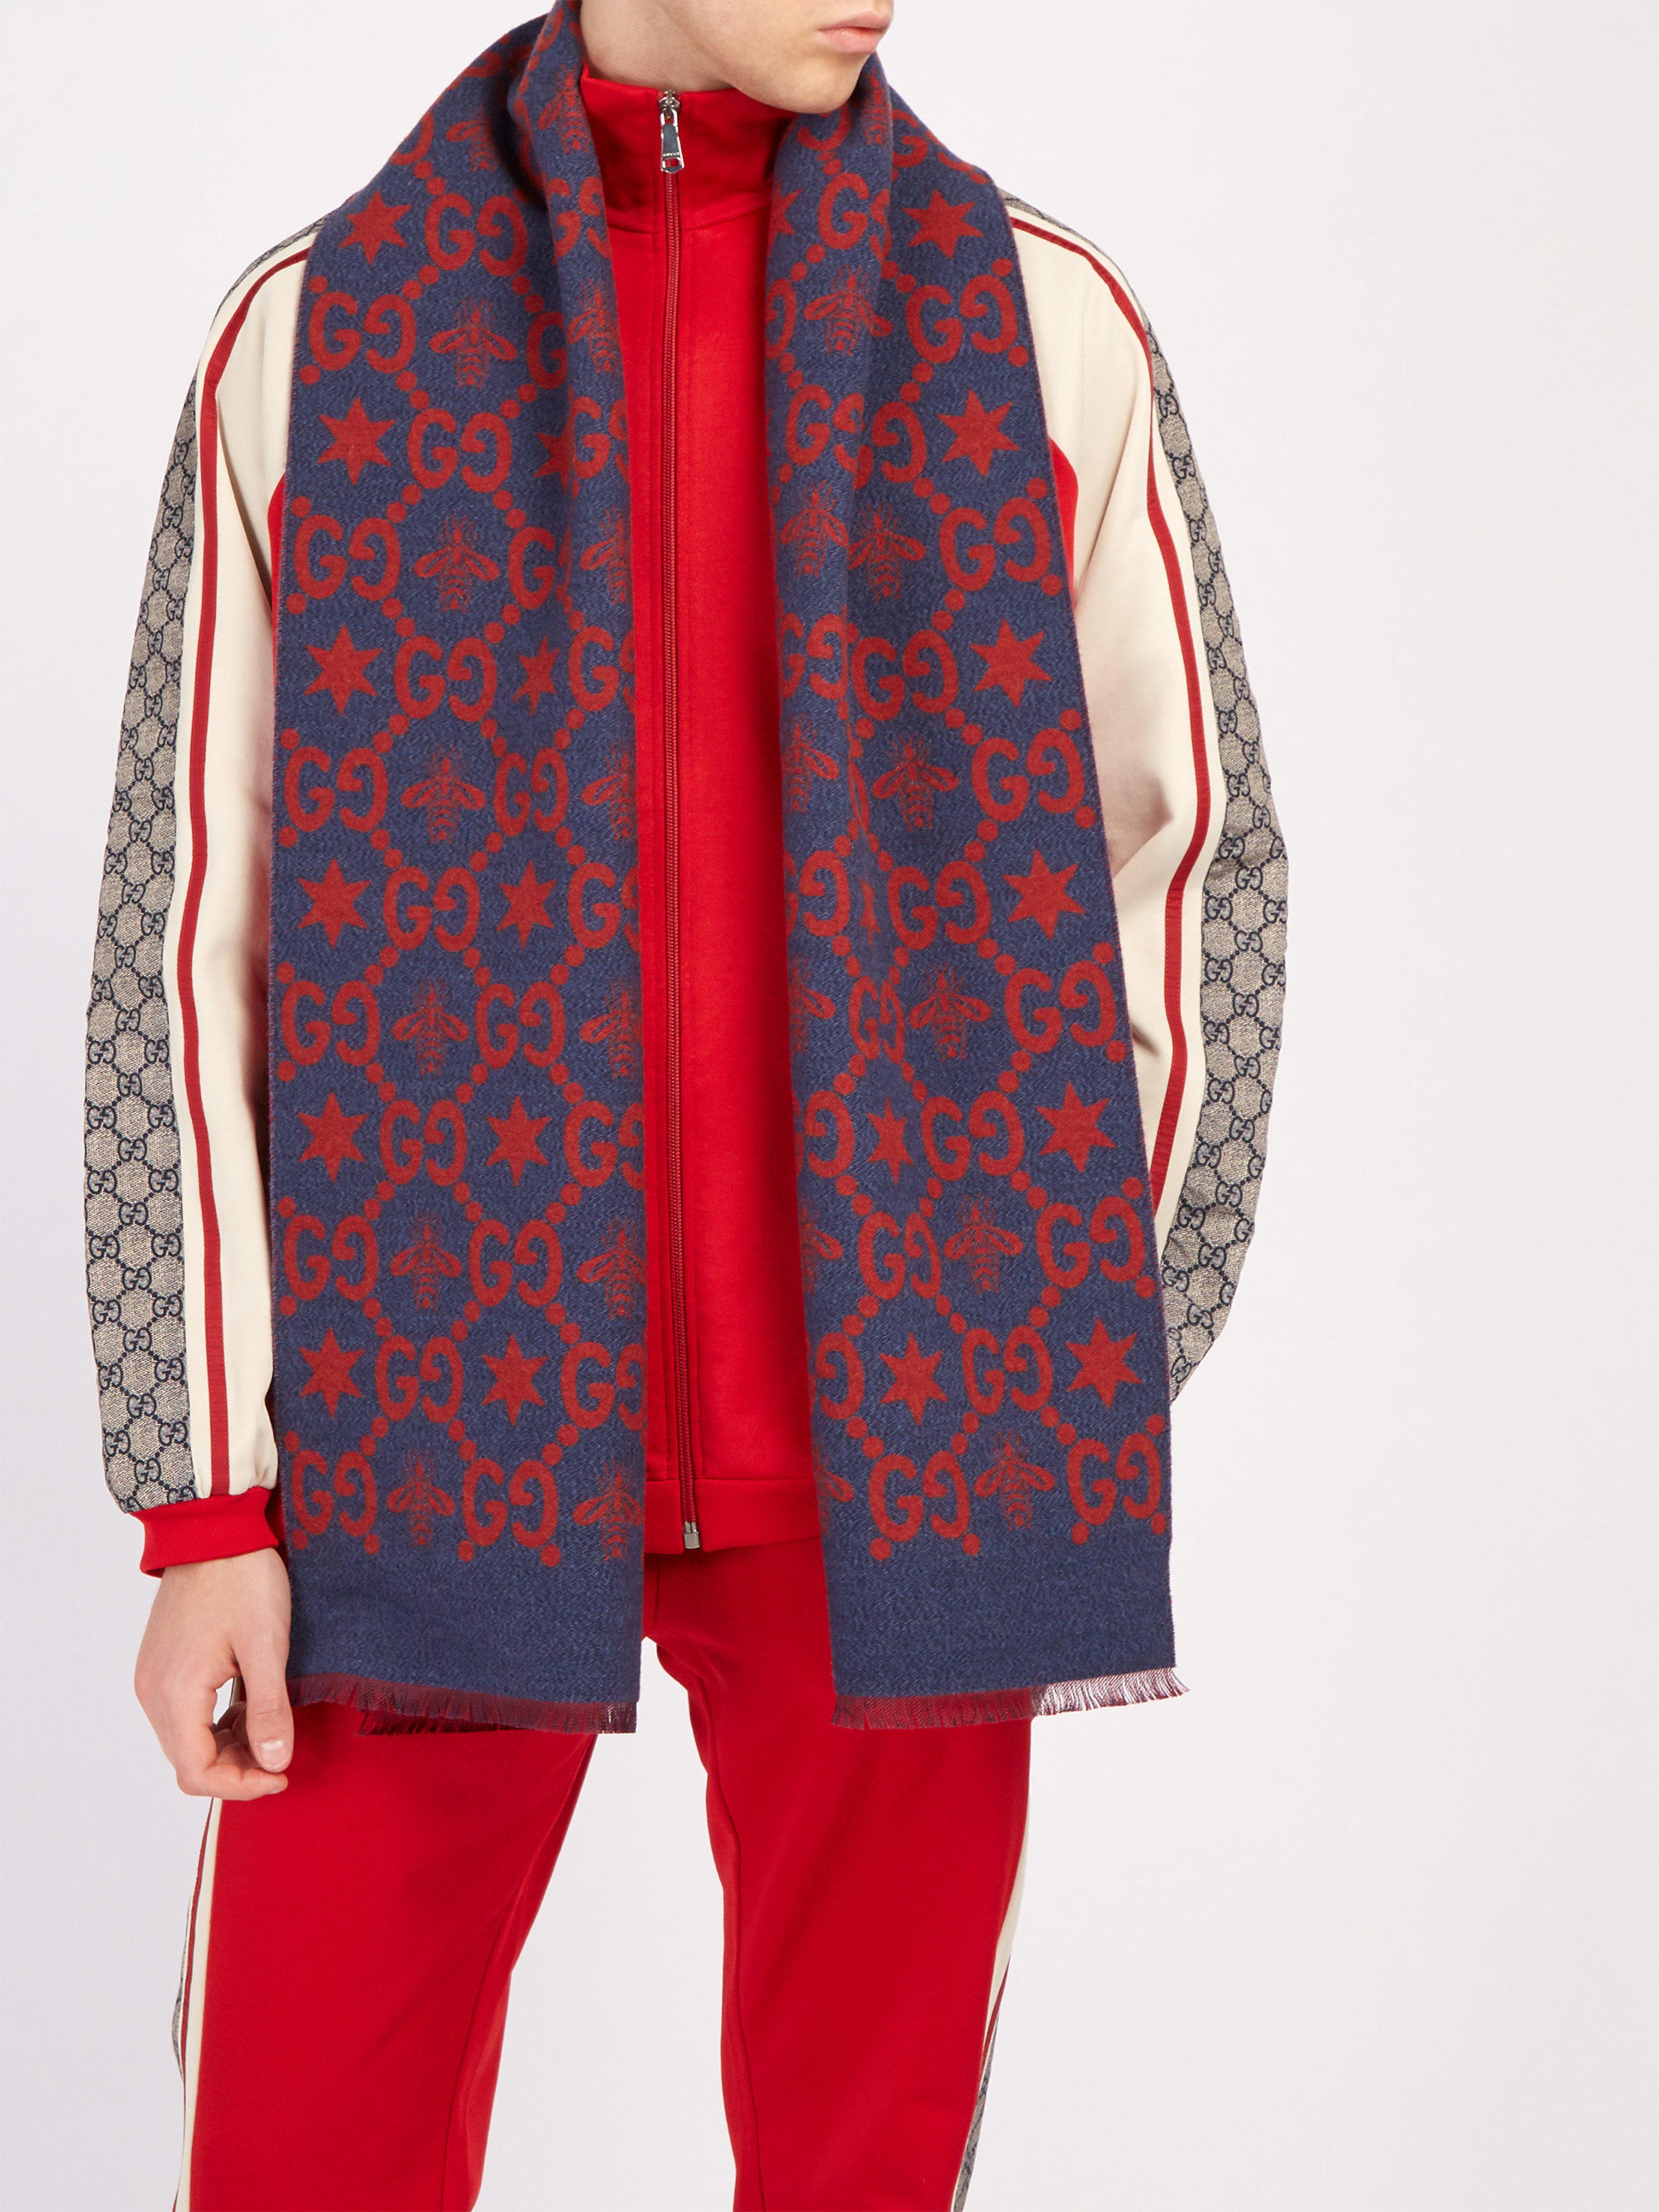 4a23e794cda05 Gucci Gg Logo Intarsia Wool Blend Scarf in Blue for Men - Lyst